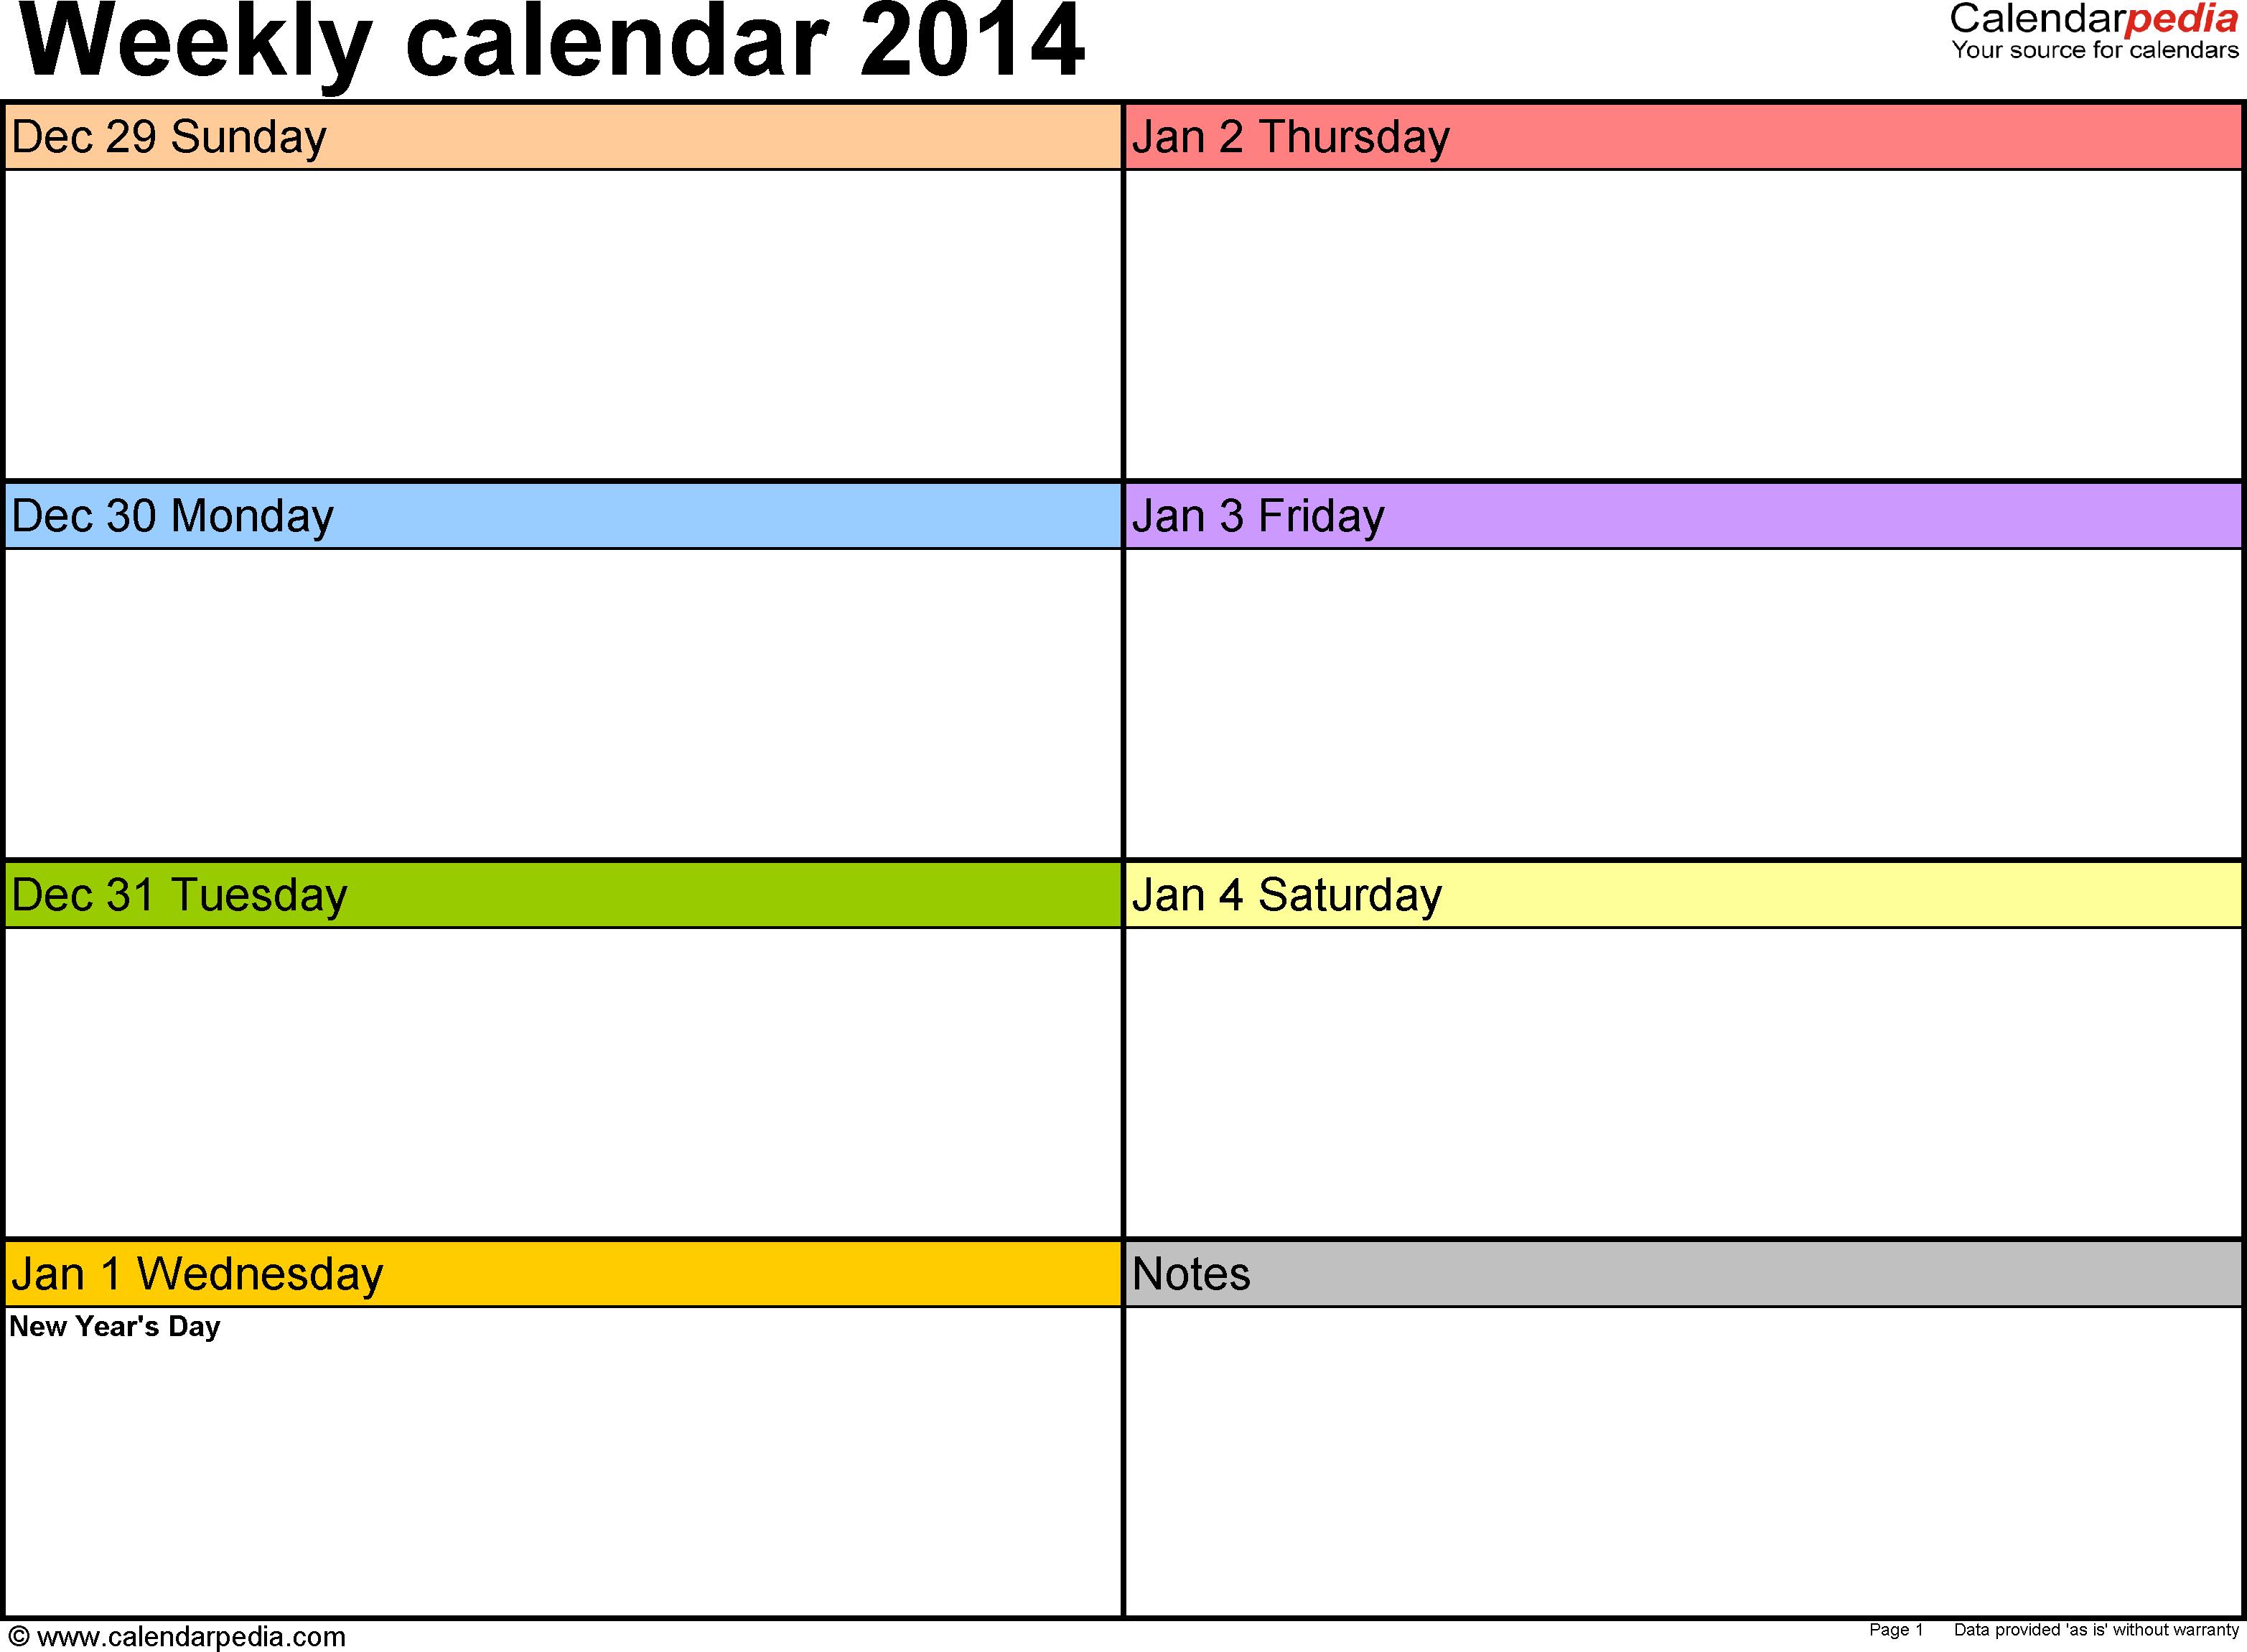 Weekly Calendar 2014 For Word - 4 Free Printable Templates for Printable Blank Weekly Calendars Templates